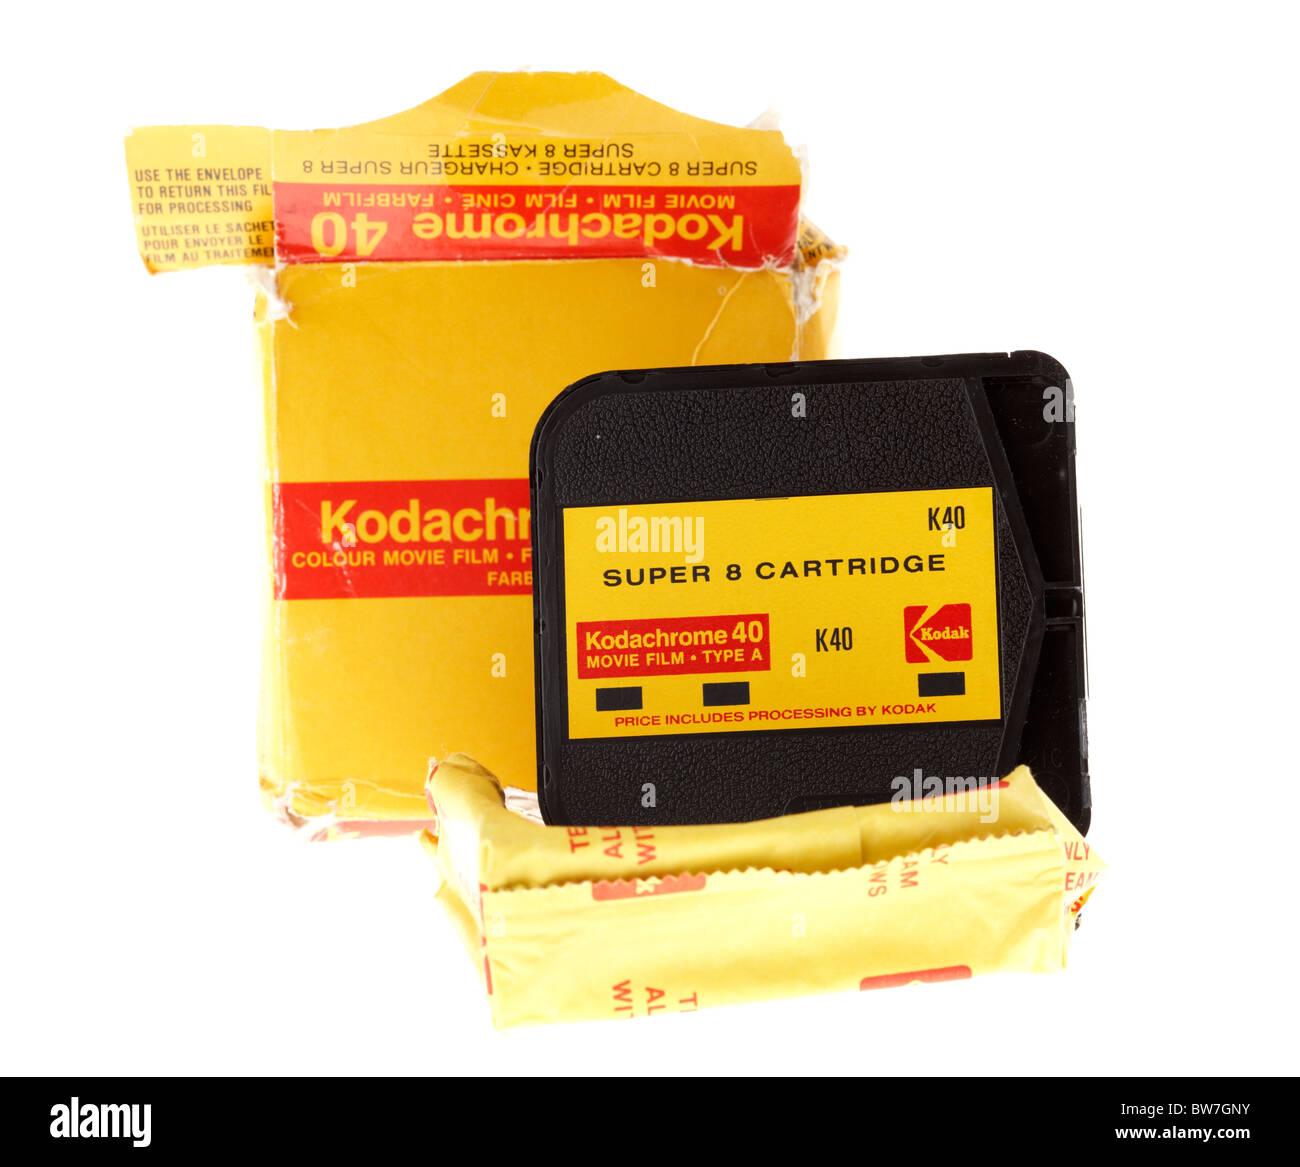 Super8 Kodachrome de Kodak cartucho de película de cine Imagen De Stock